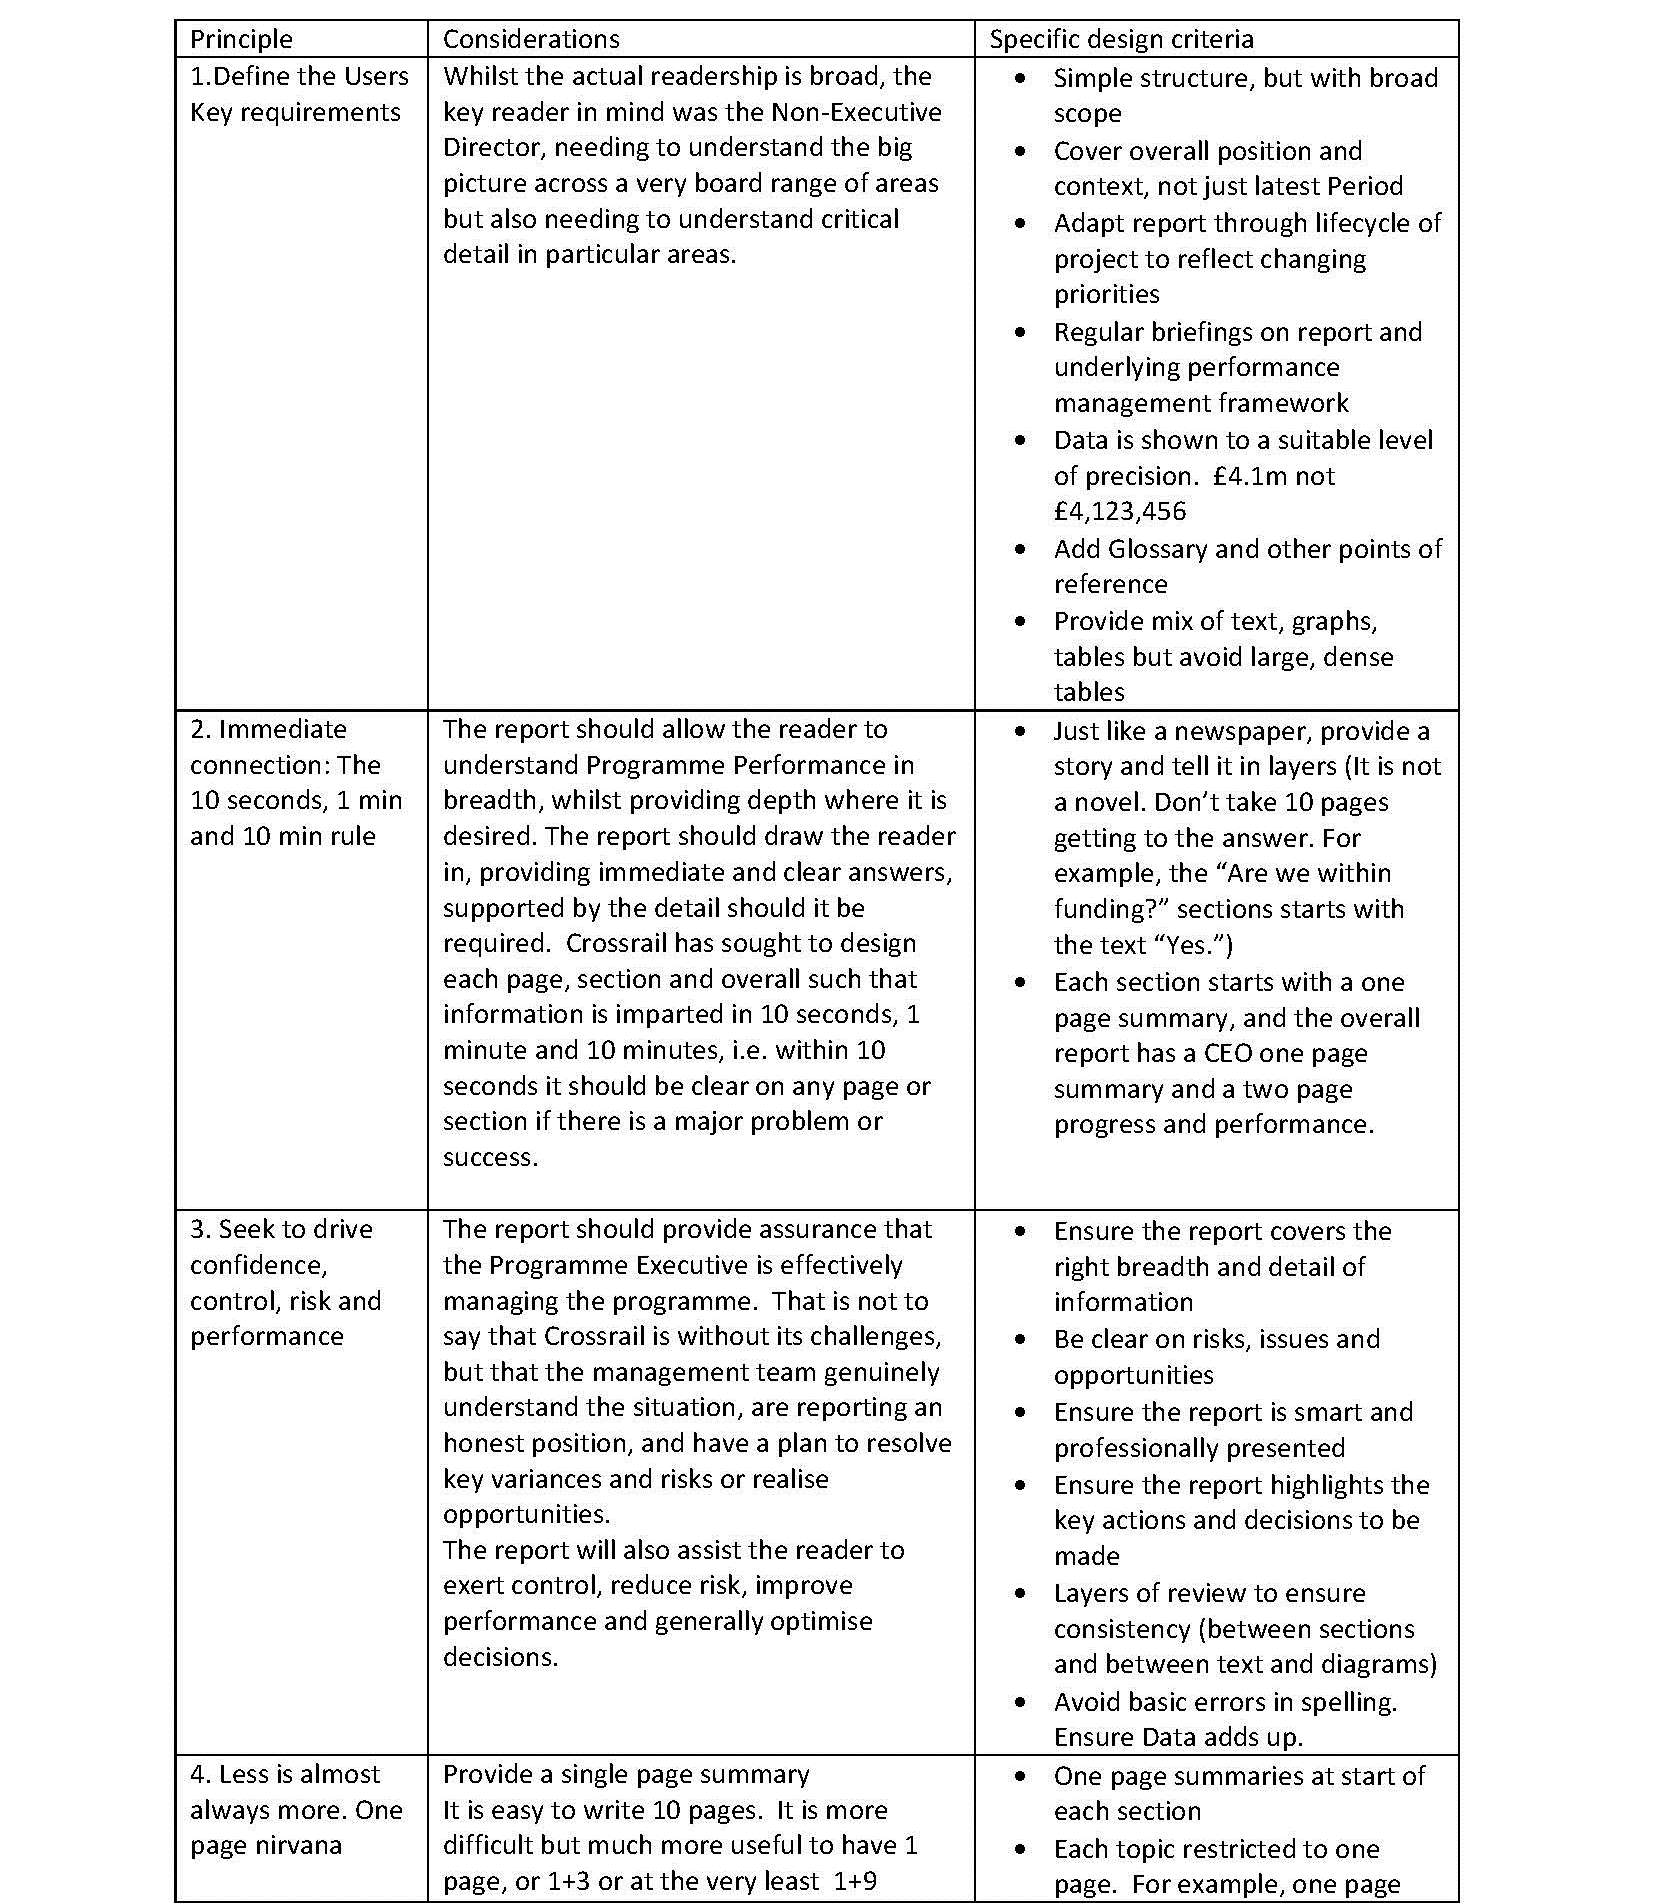 1J 001_Table 1_Guiding Principles_Page_1v2.jpg